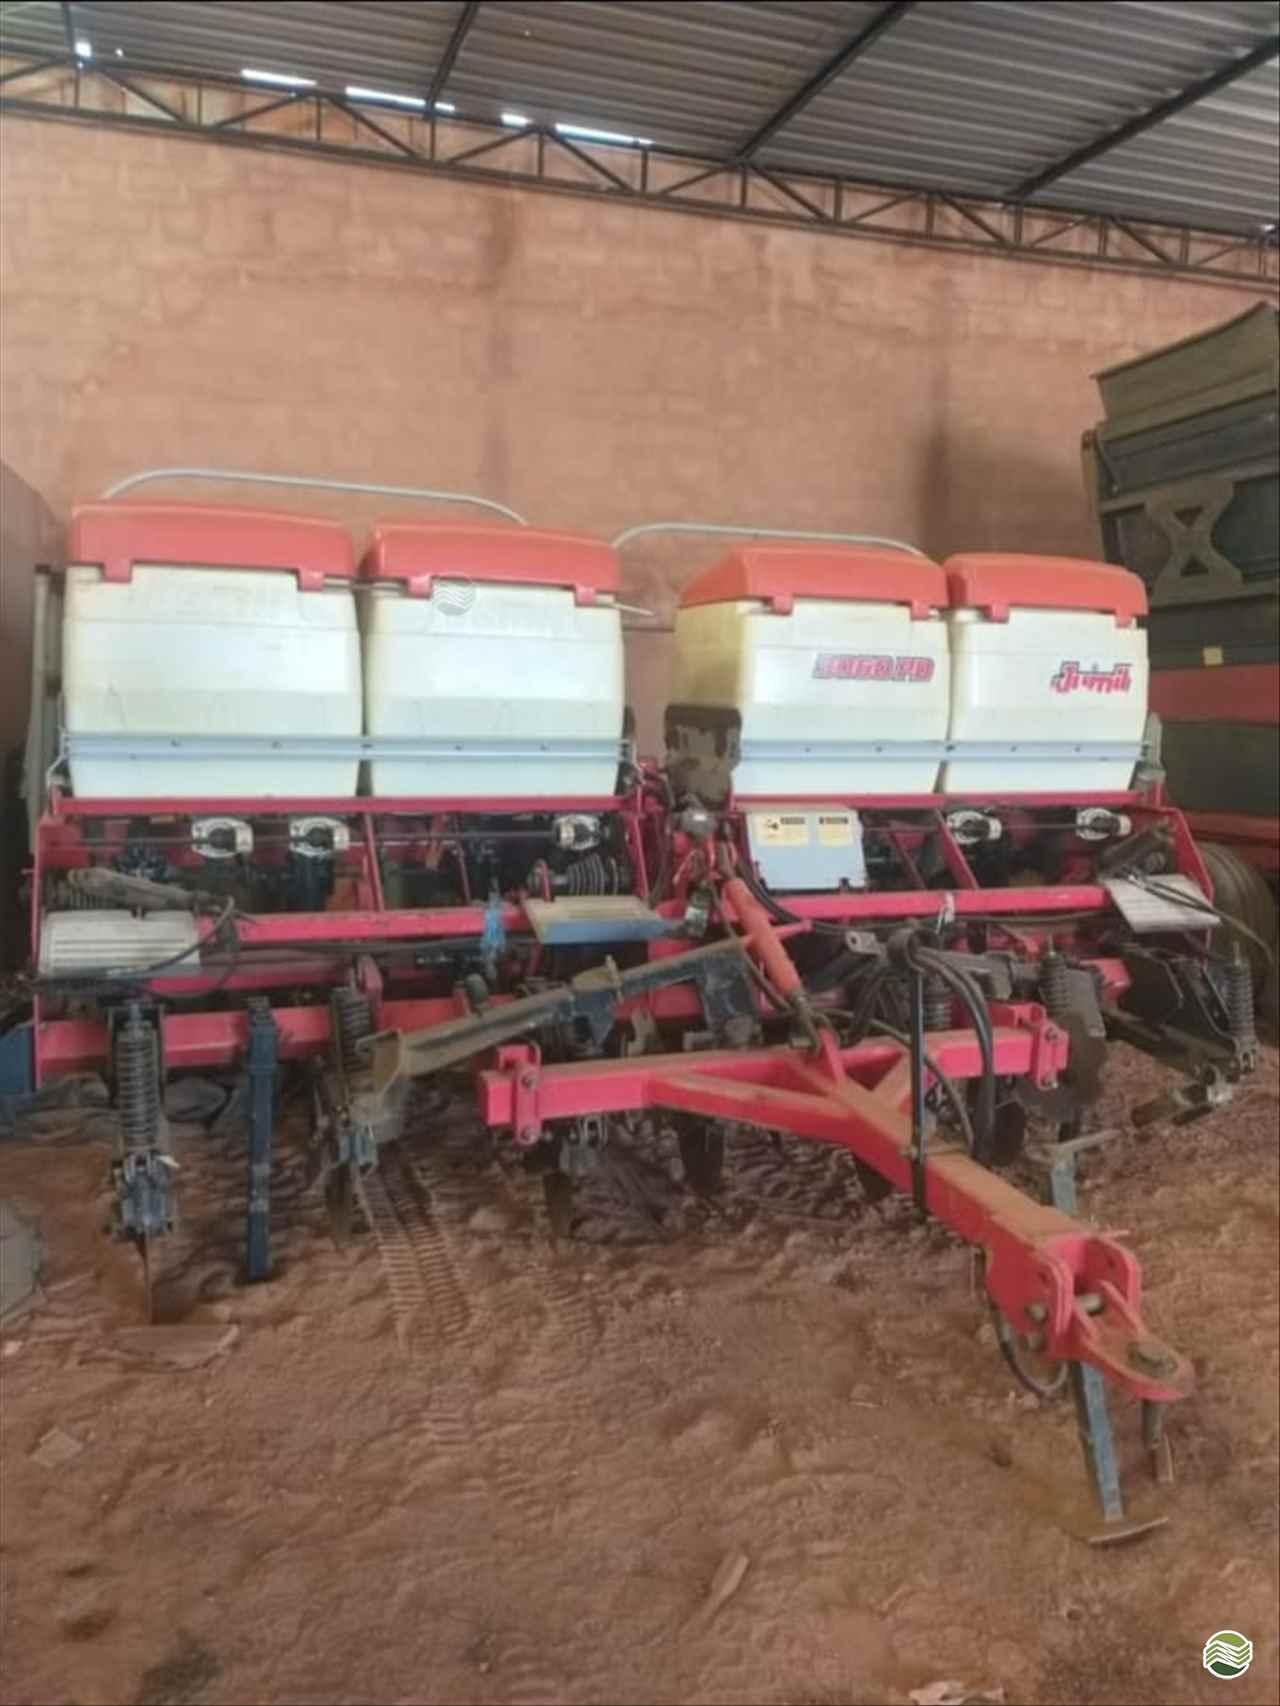 PLANTADEIRA JUMIL JM 3060 Gerominho Implementos Agrícolas UBERLANDIA MINAS GERAIS MG